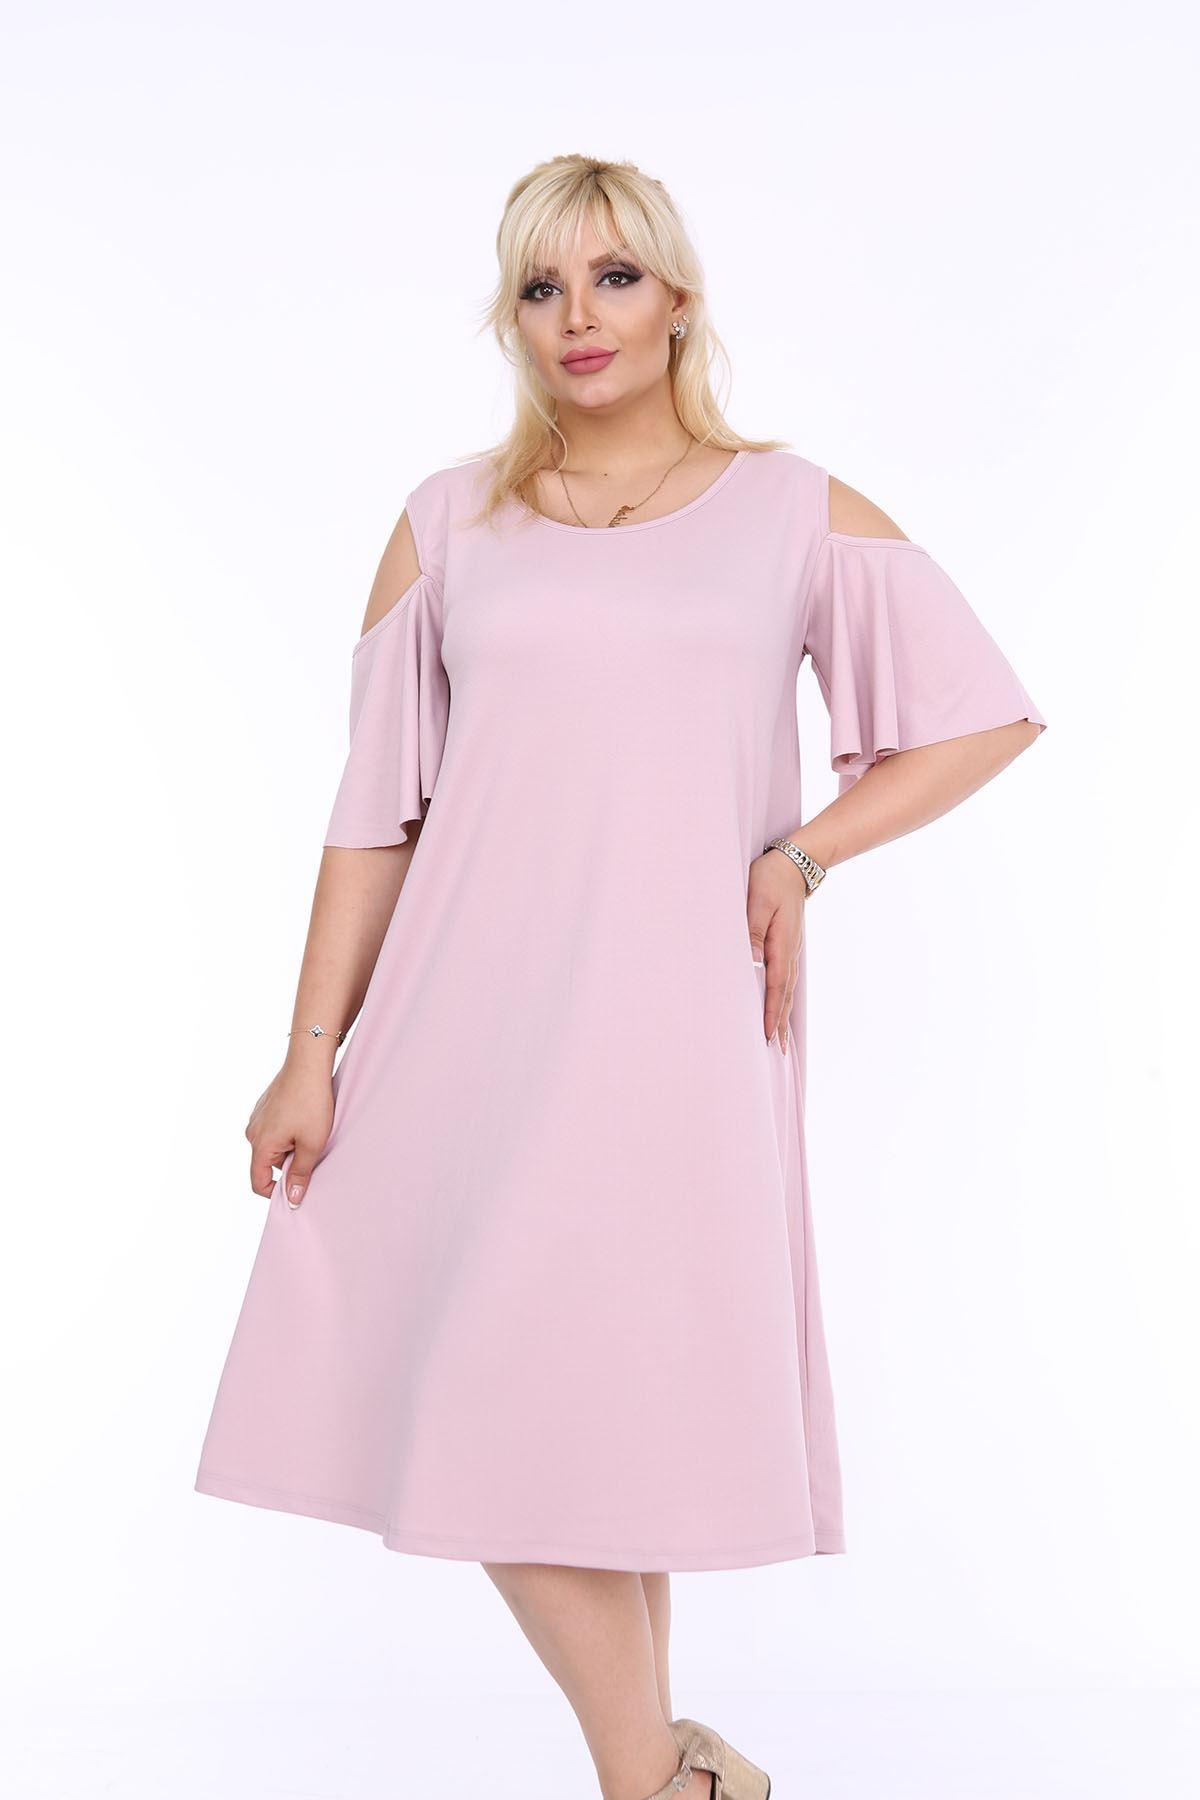 Pudra Yazlık Elbise 1B-0506